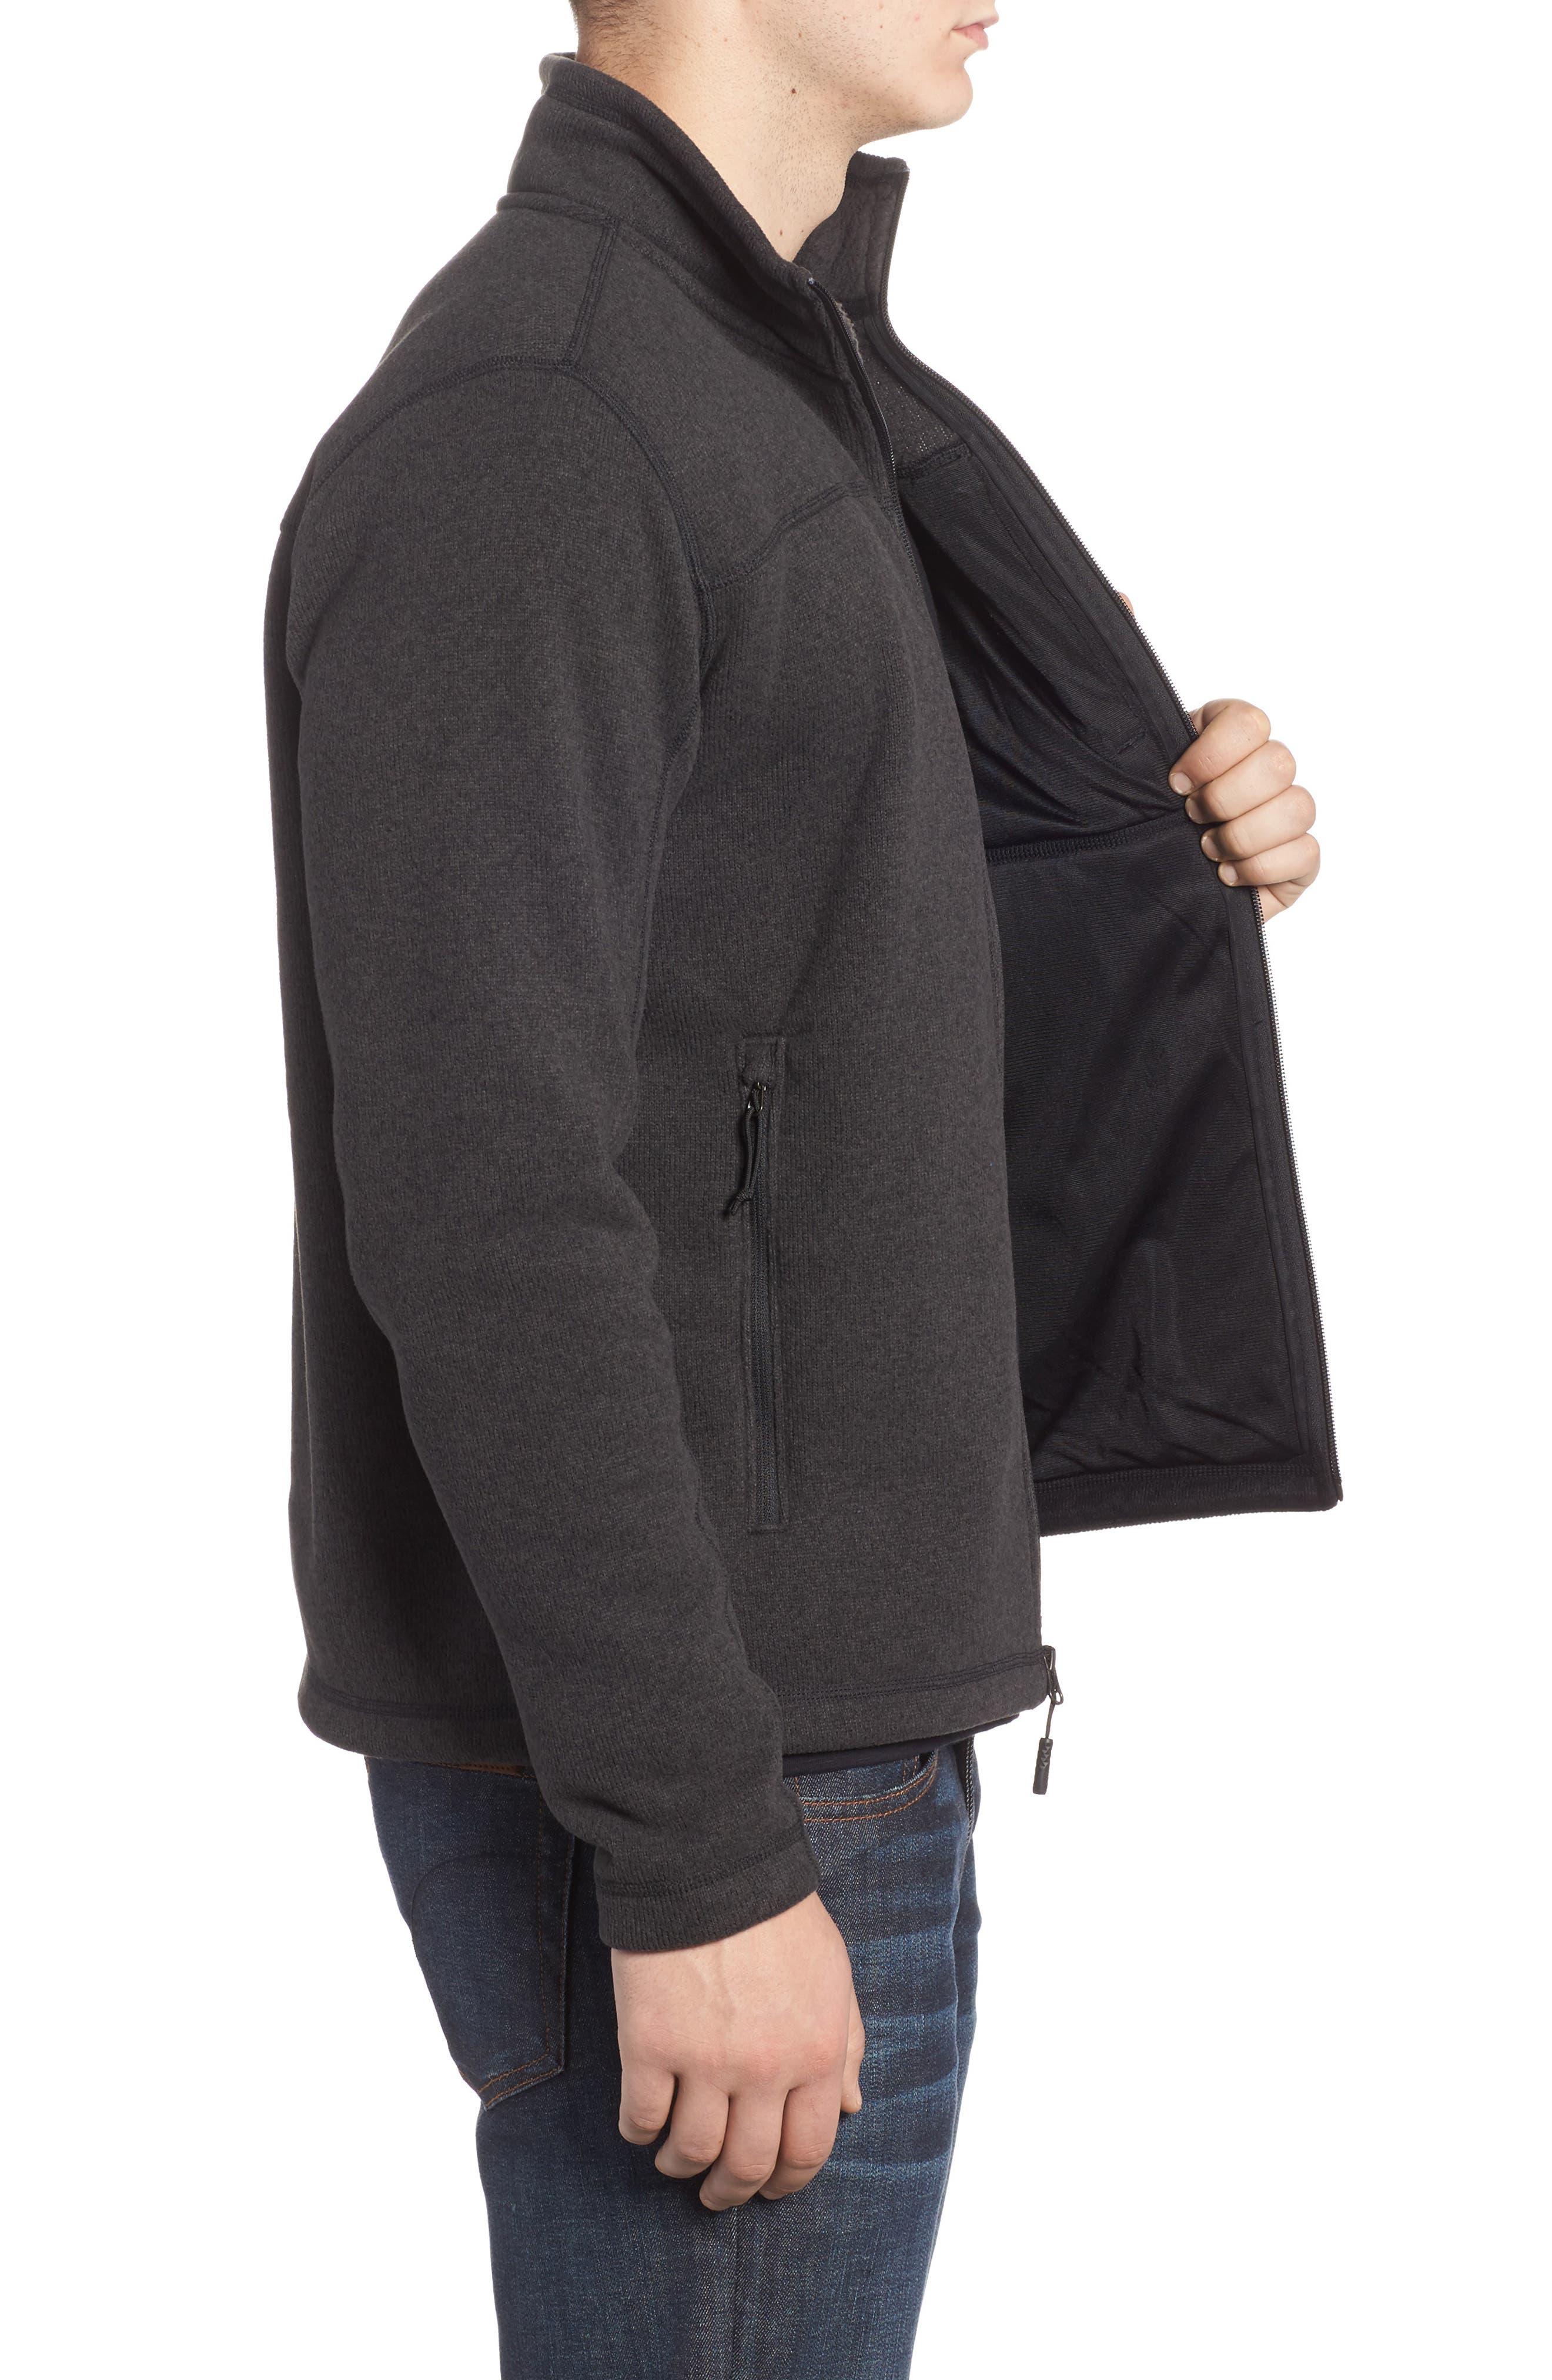 THE NORTH FACE, 'Gordon Lyons' Zip Fleece Jacket, Alternate thumbnail 3, color, 001